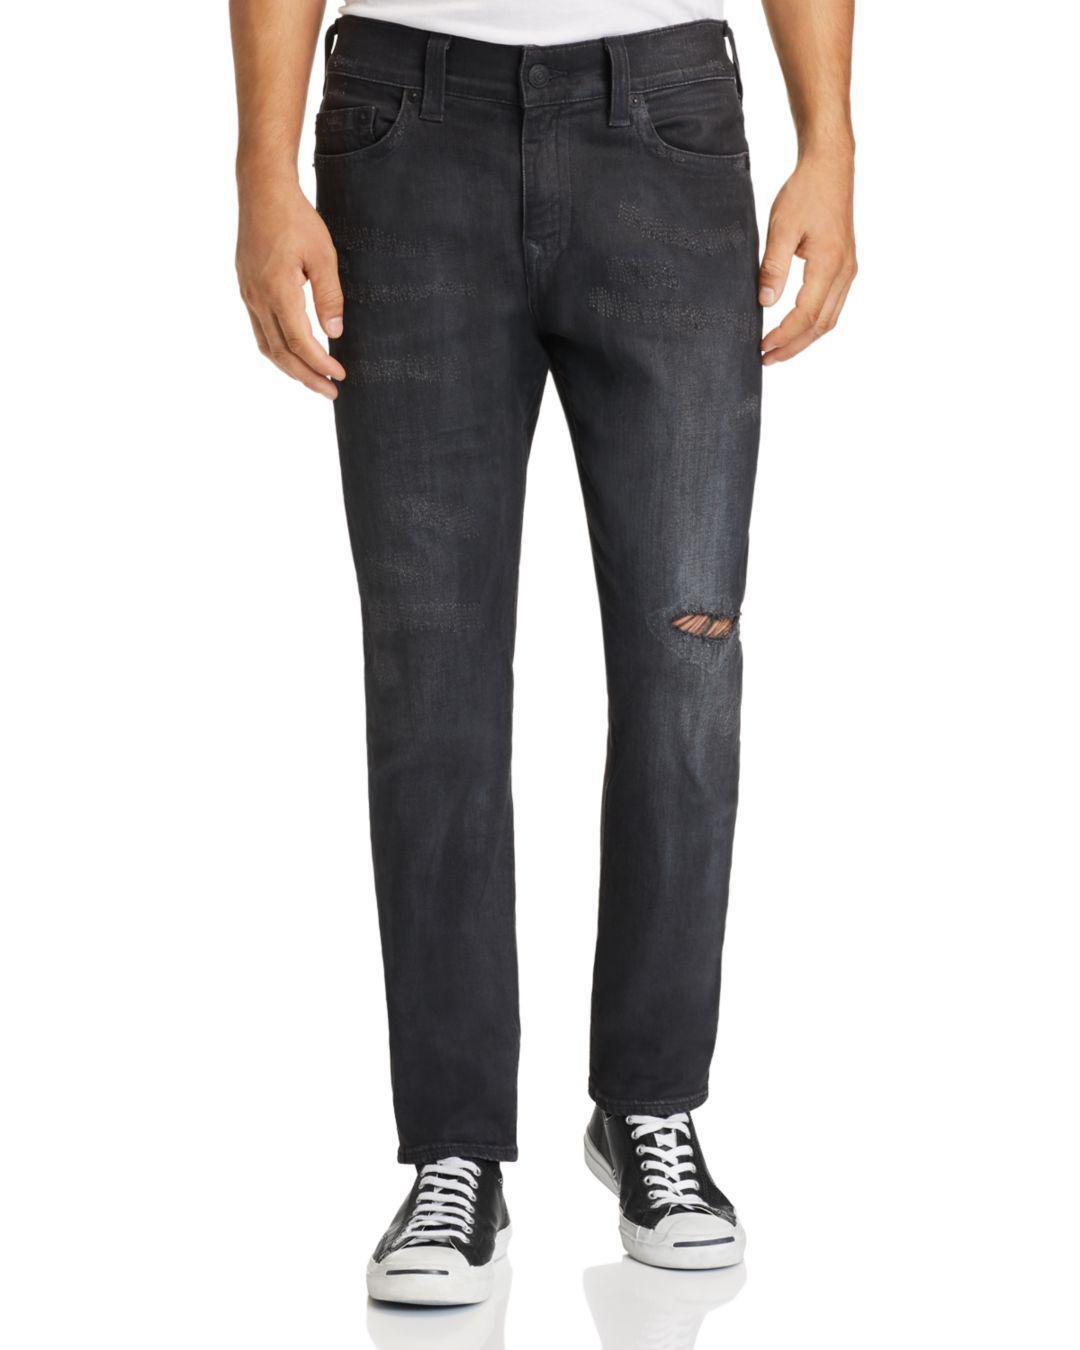 b49faa6a1869 Lyst - True Religion Rocco Slim Fit Jeans In Dark Asteroid in Blue ...